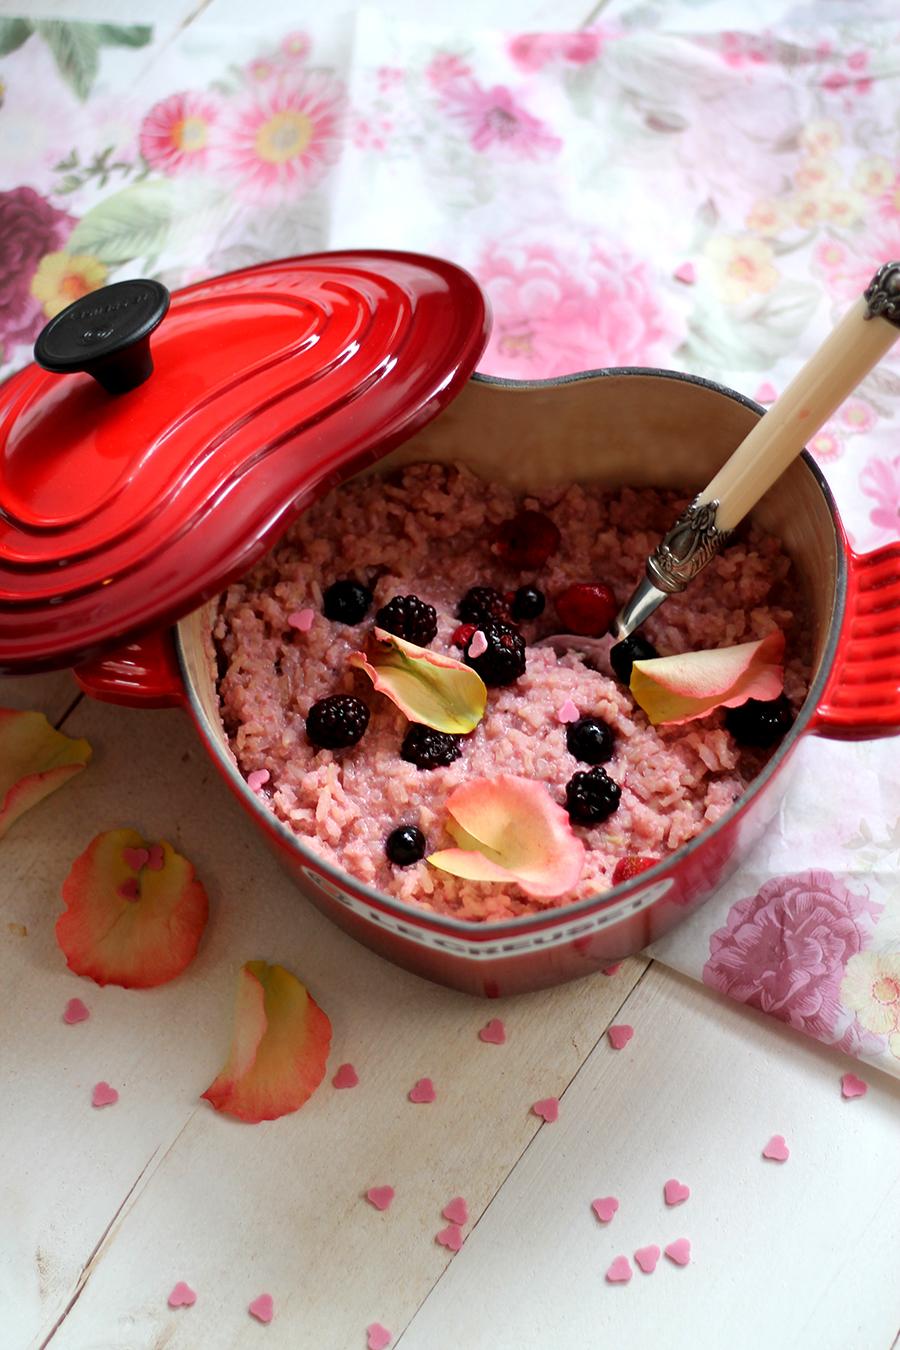 Valentijnsontbijt: Roze bosvruchten rijstpap